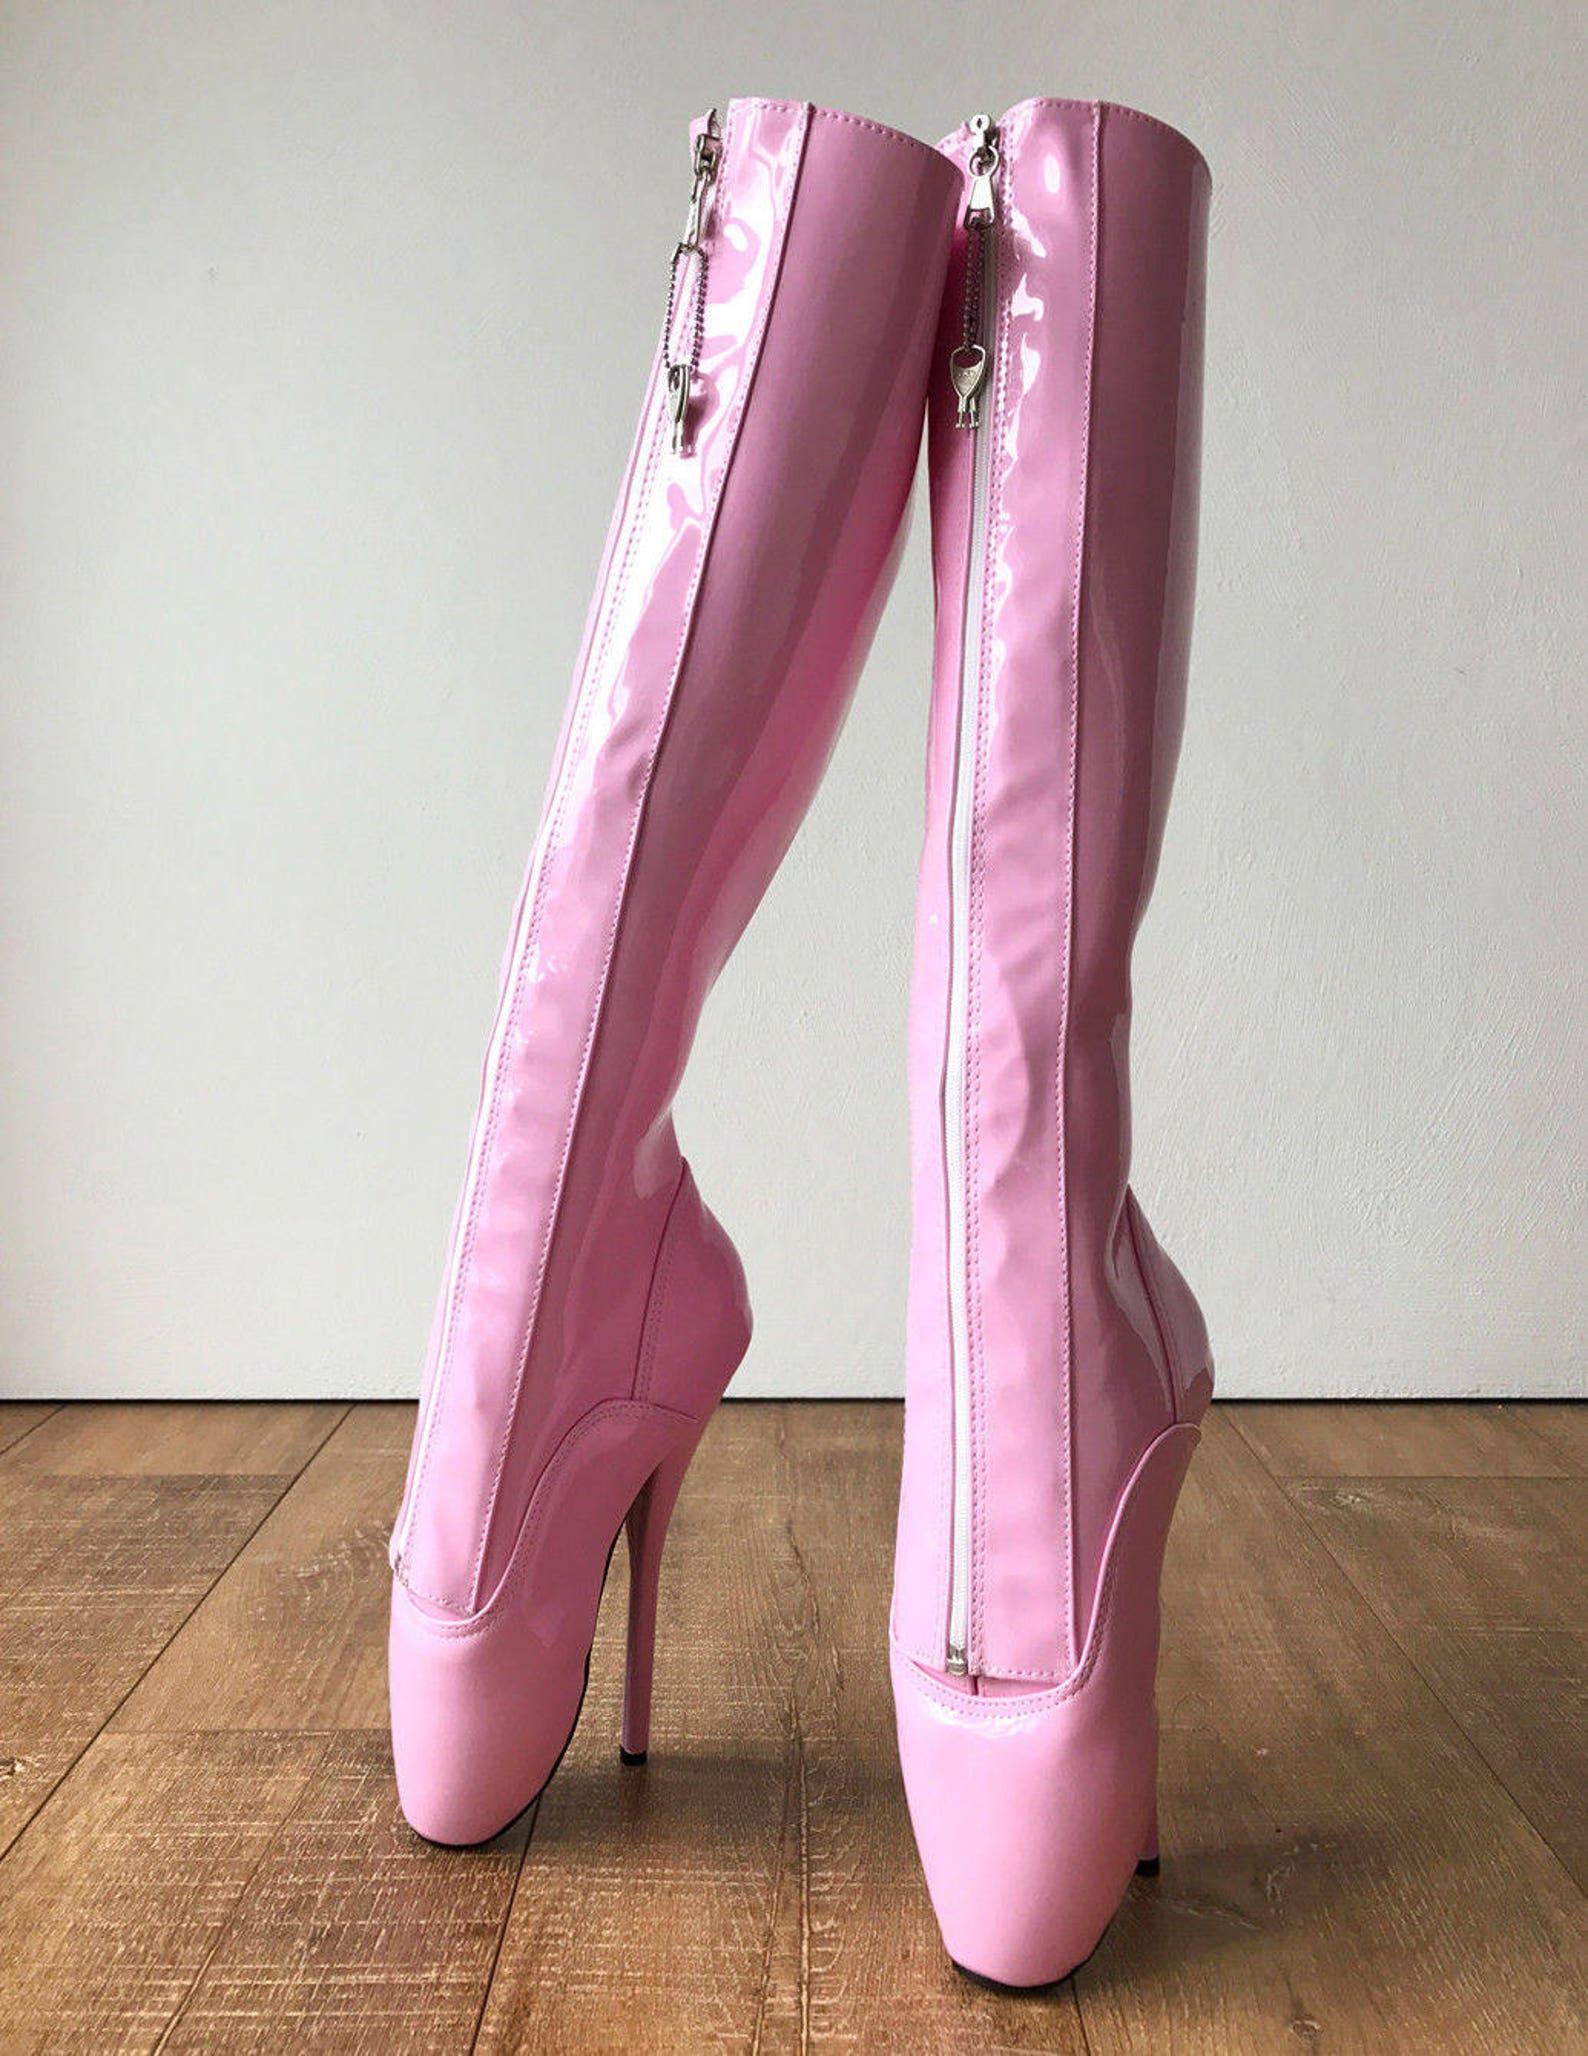 secret ii ballet pointe boots fetish pinup ballet lockable zipper light pink